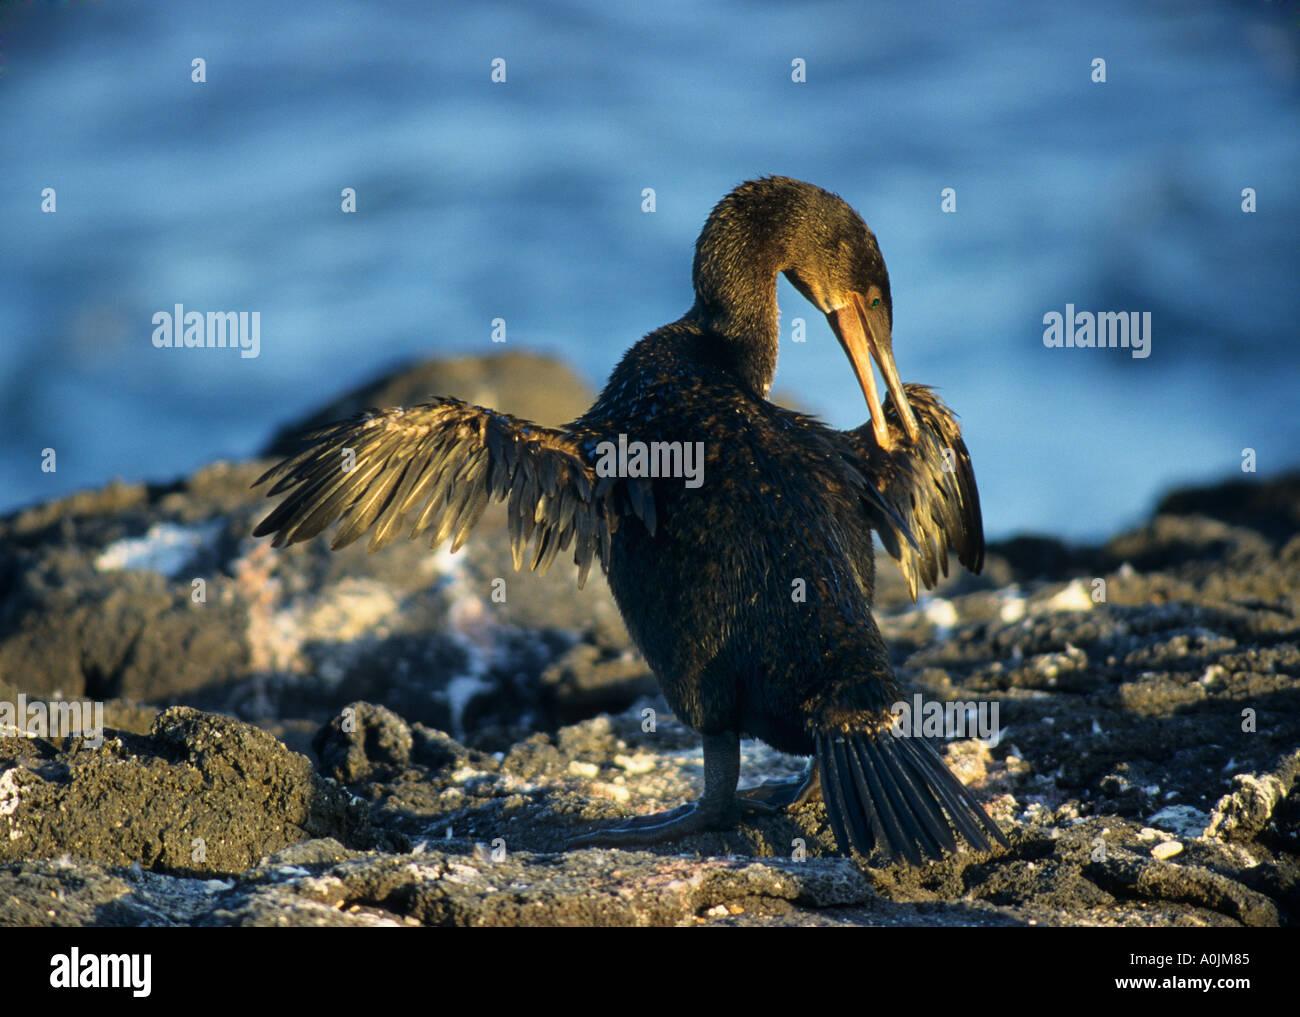 Flightless Cormorant preening Phalacrocorax harrisi - Stock Image